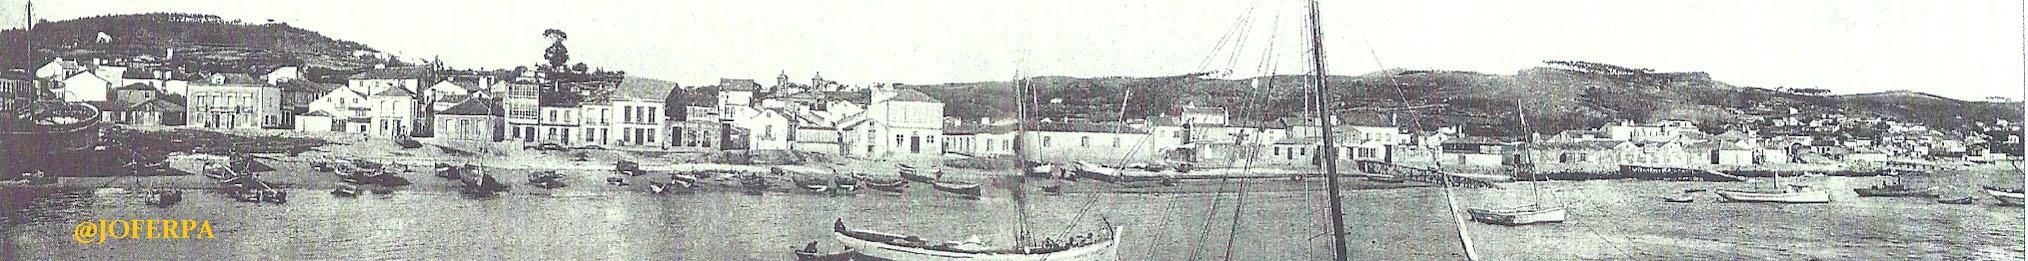 1914 Riveira dique. Arquivo Joferpa.